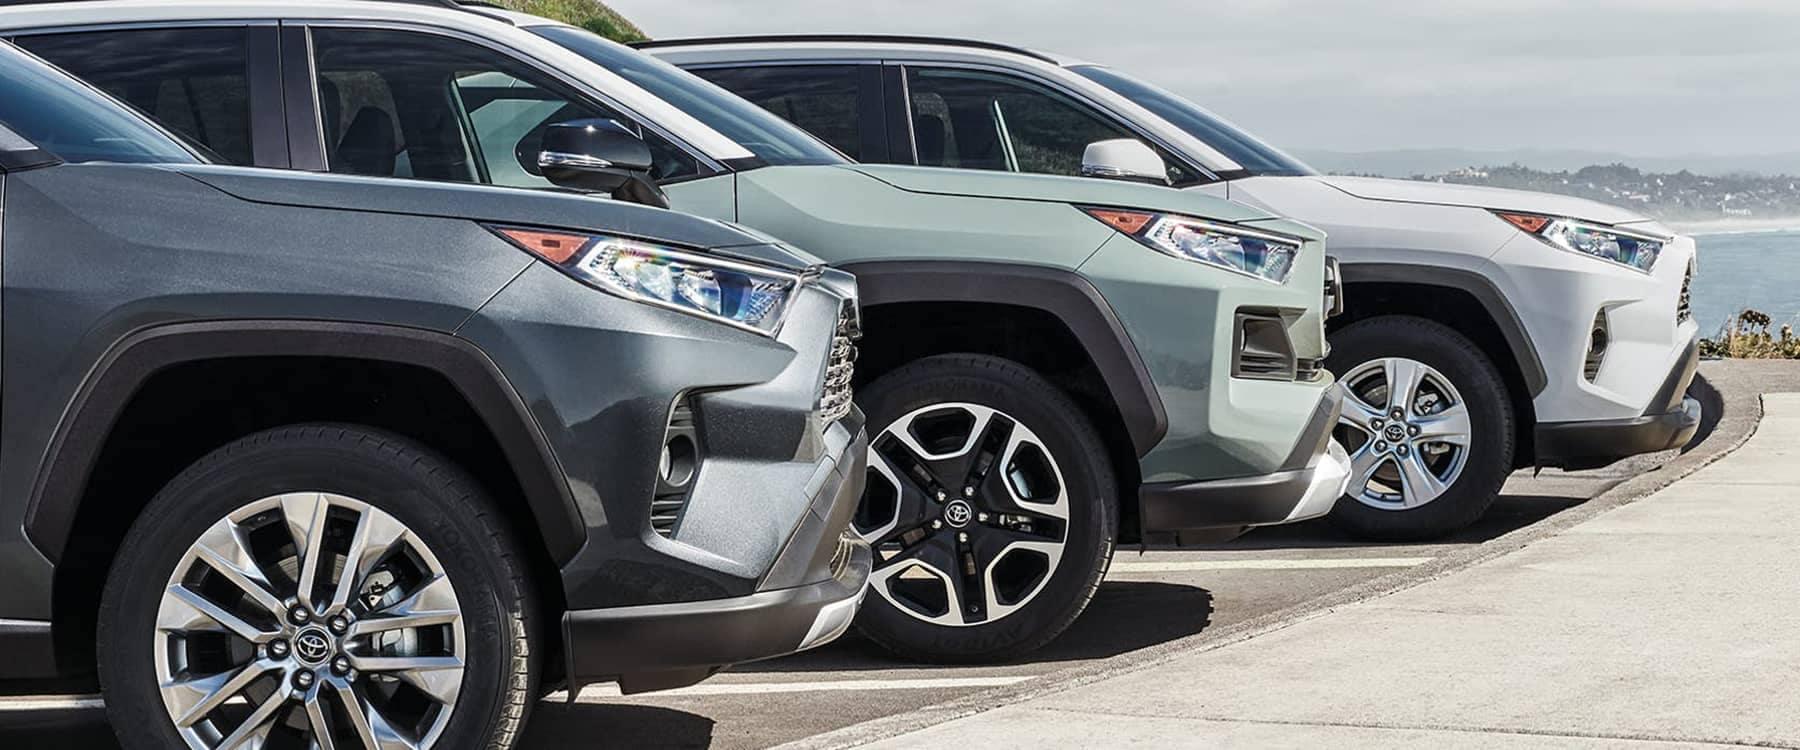 Three 2021 Toyota RAV4s parked